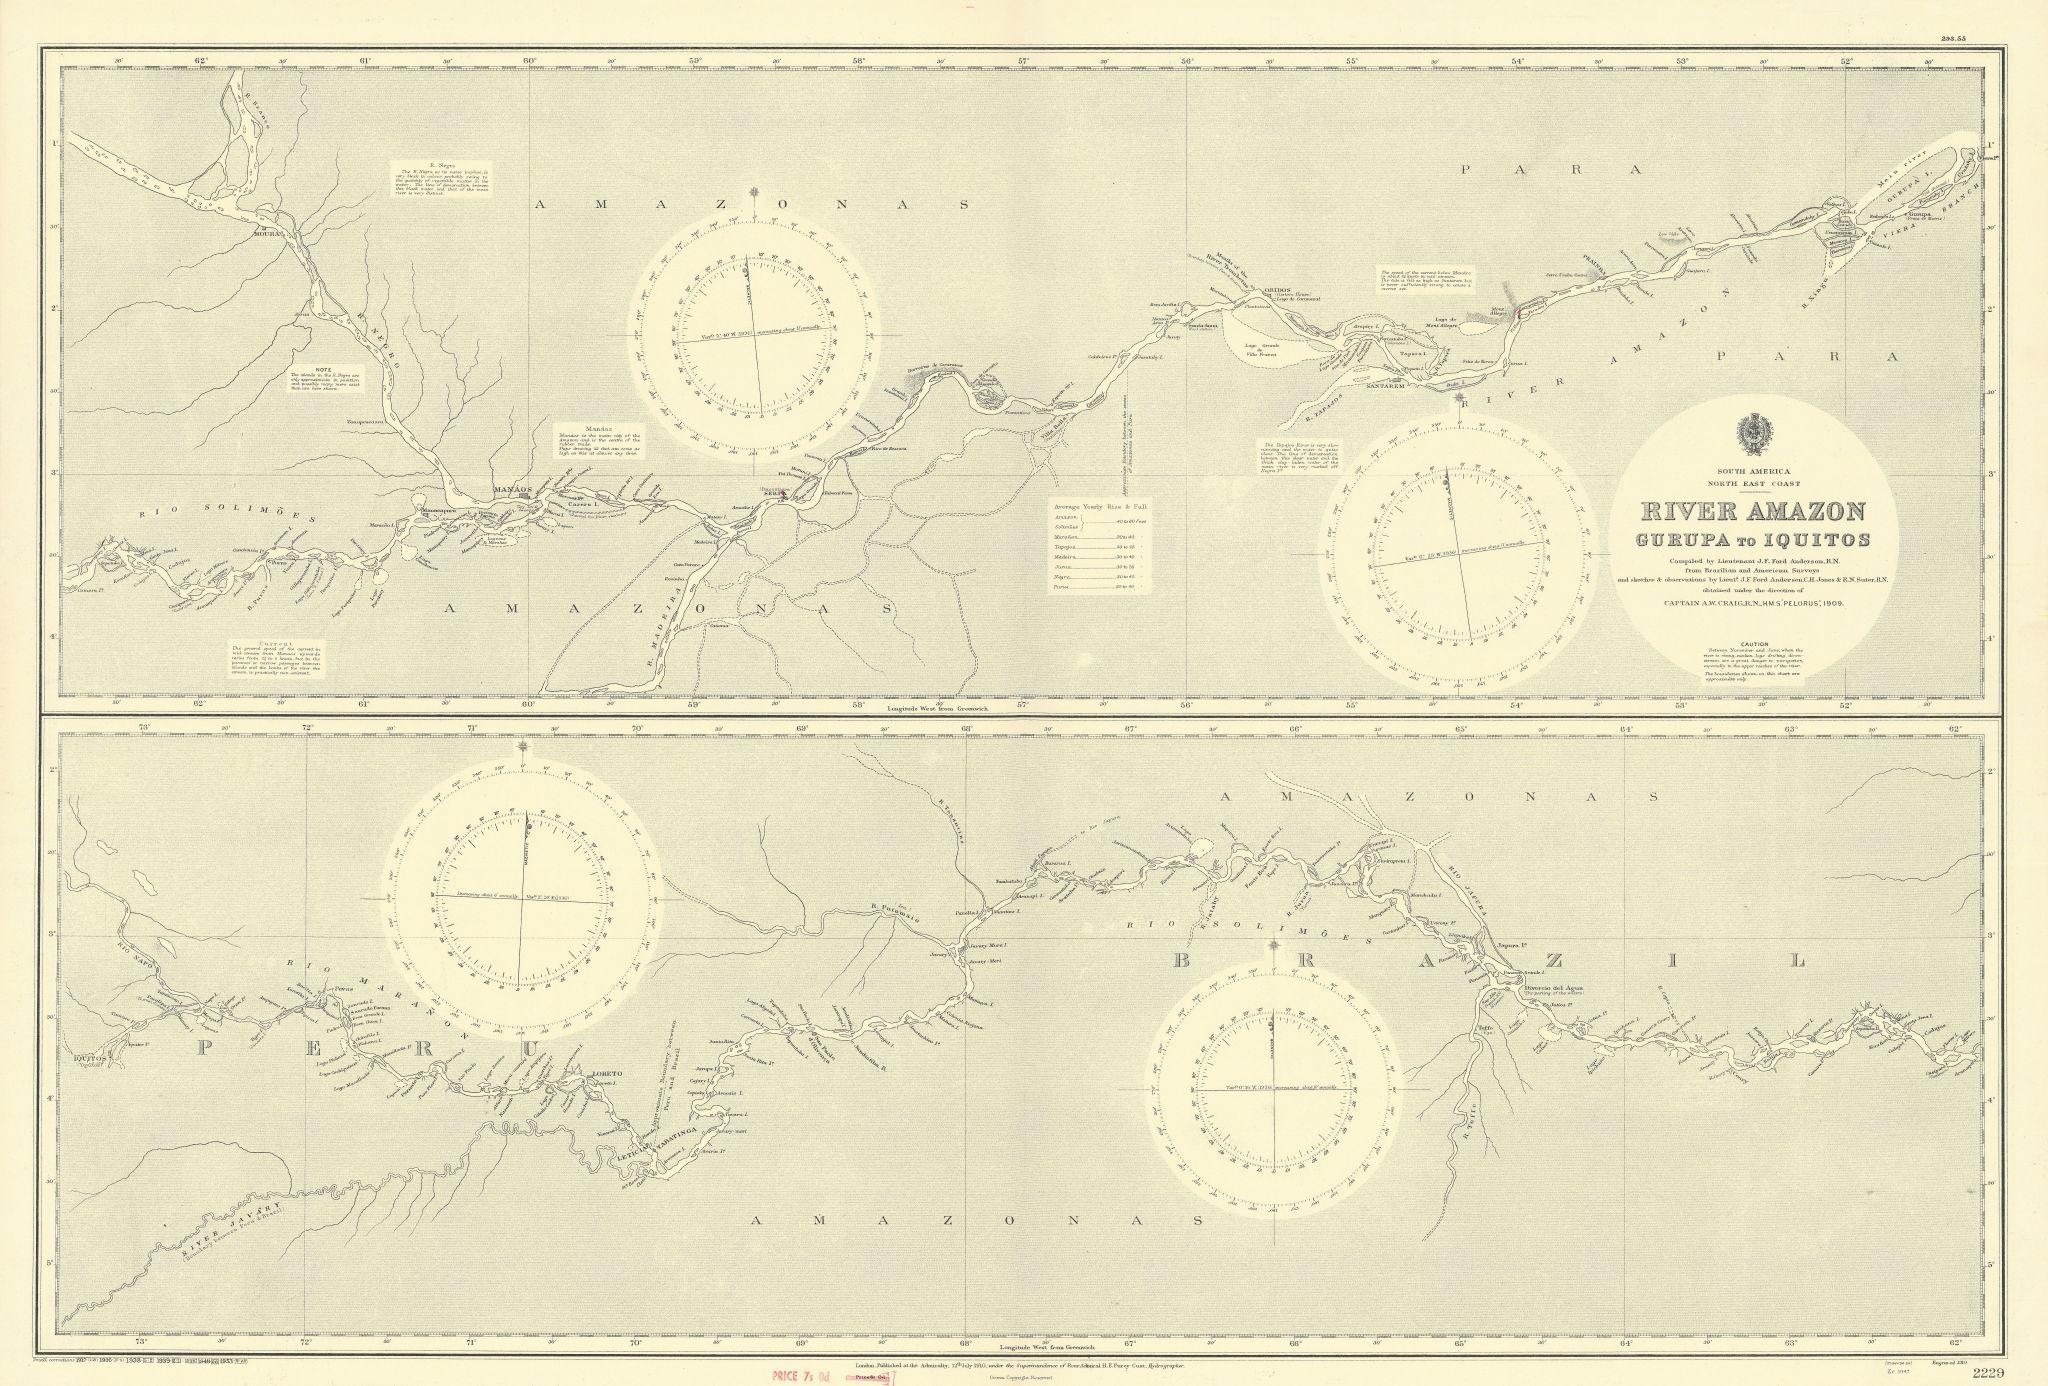 River Amazon. Gurupa - Iquitos. Brazil Peru. ADMIRALTY sea chart 1910 (1953) map